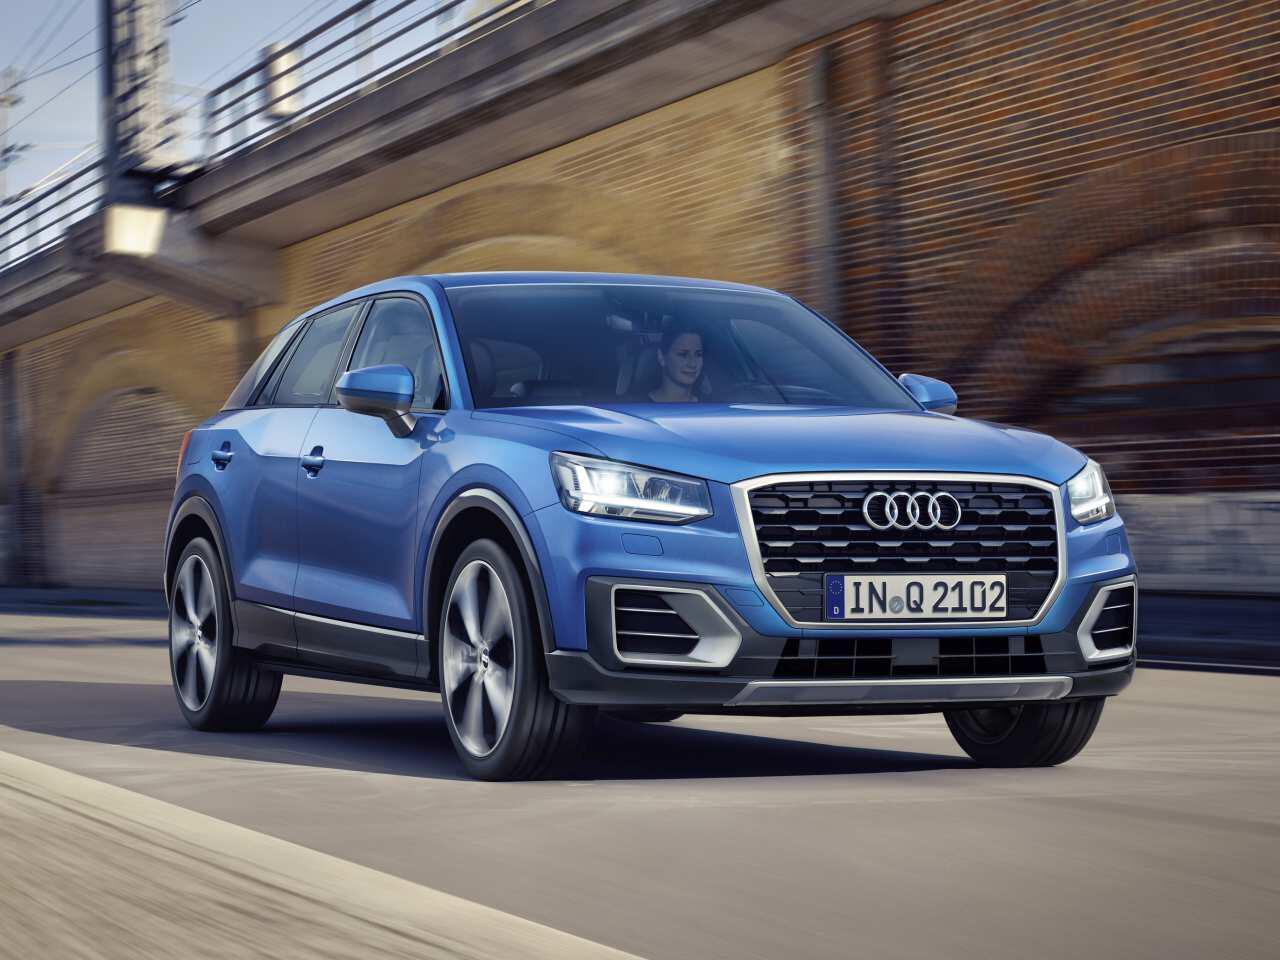 Bild zu Audi Q2 Singleframe